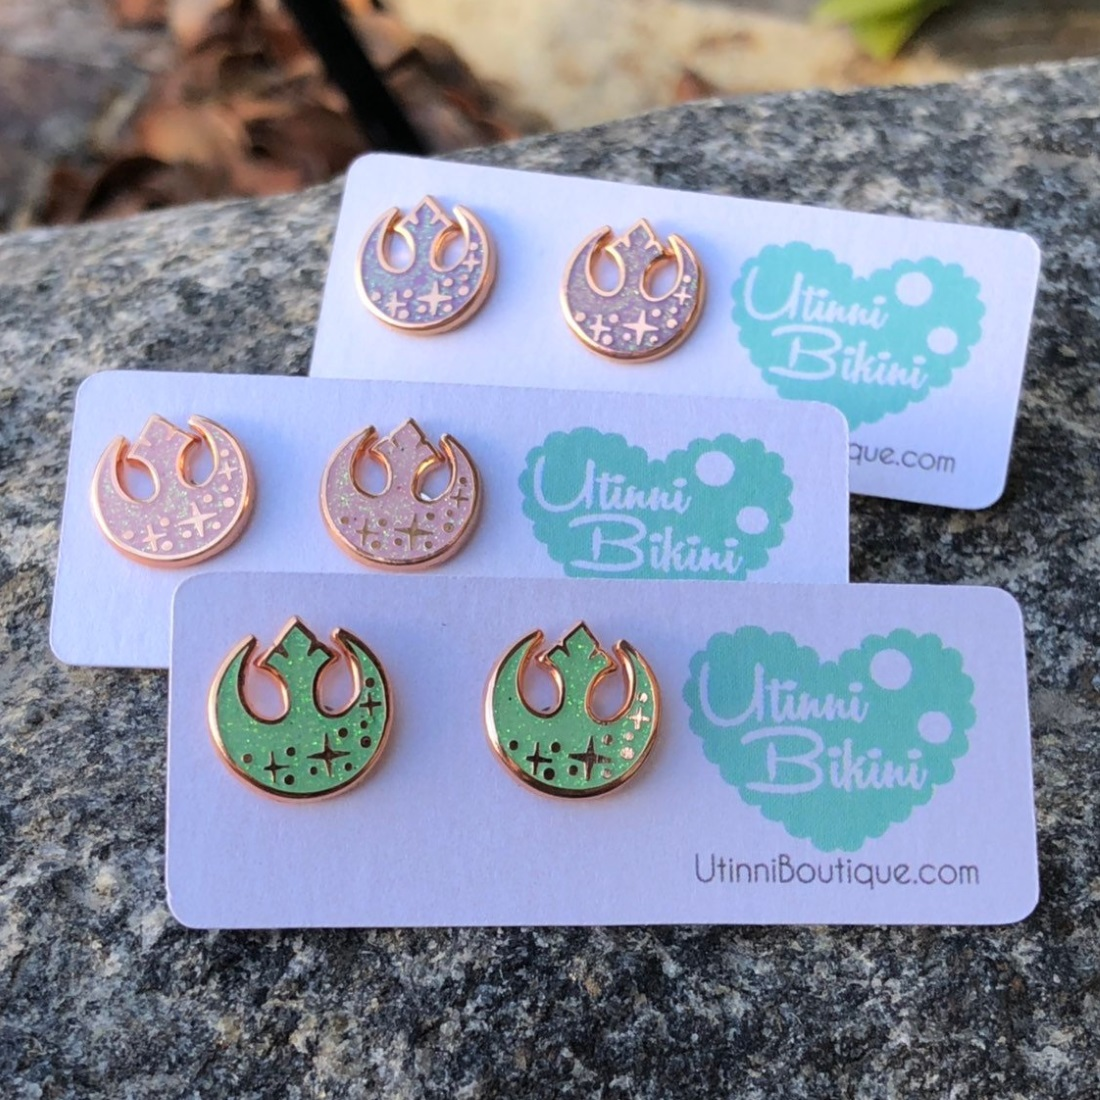 Star Wars stud earrings by Etsy seller Utinni Bikini